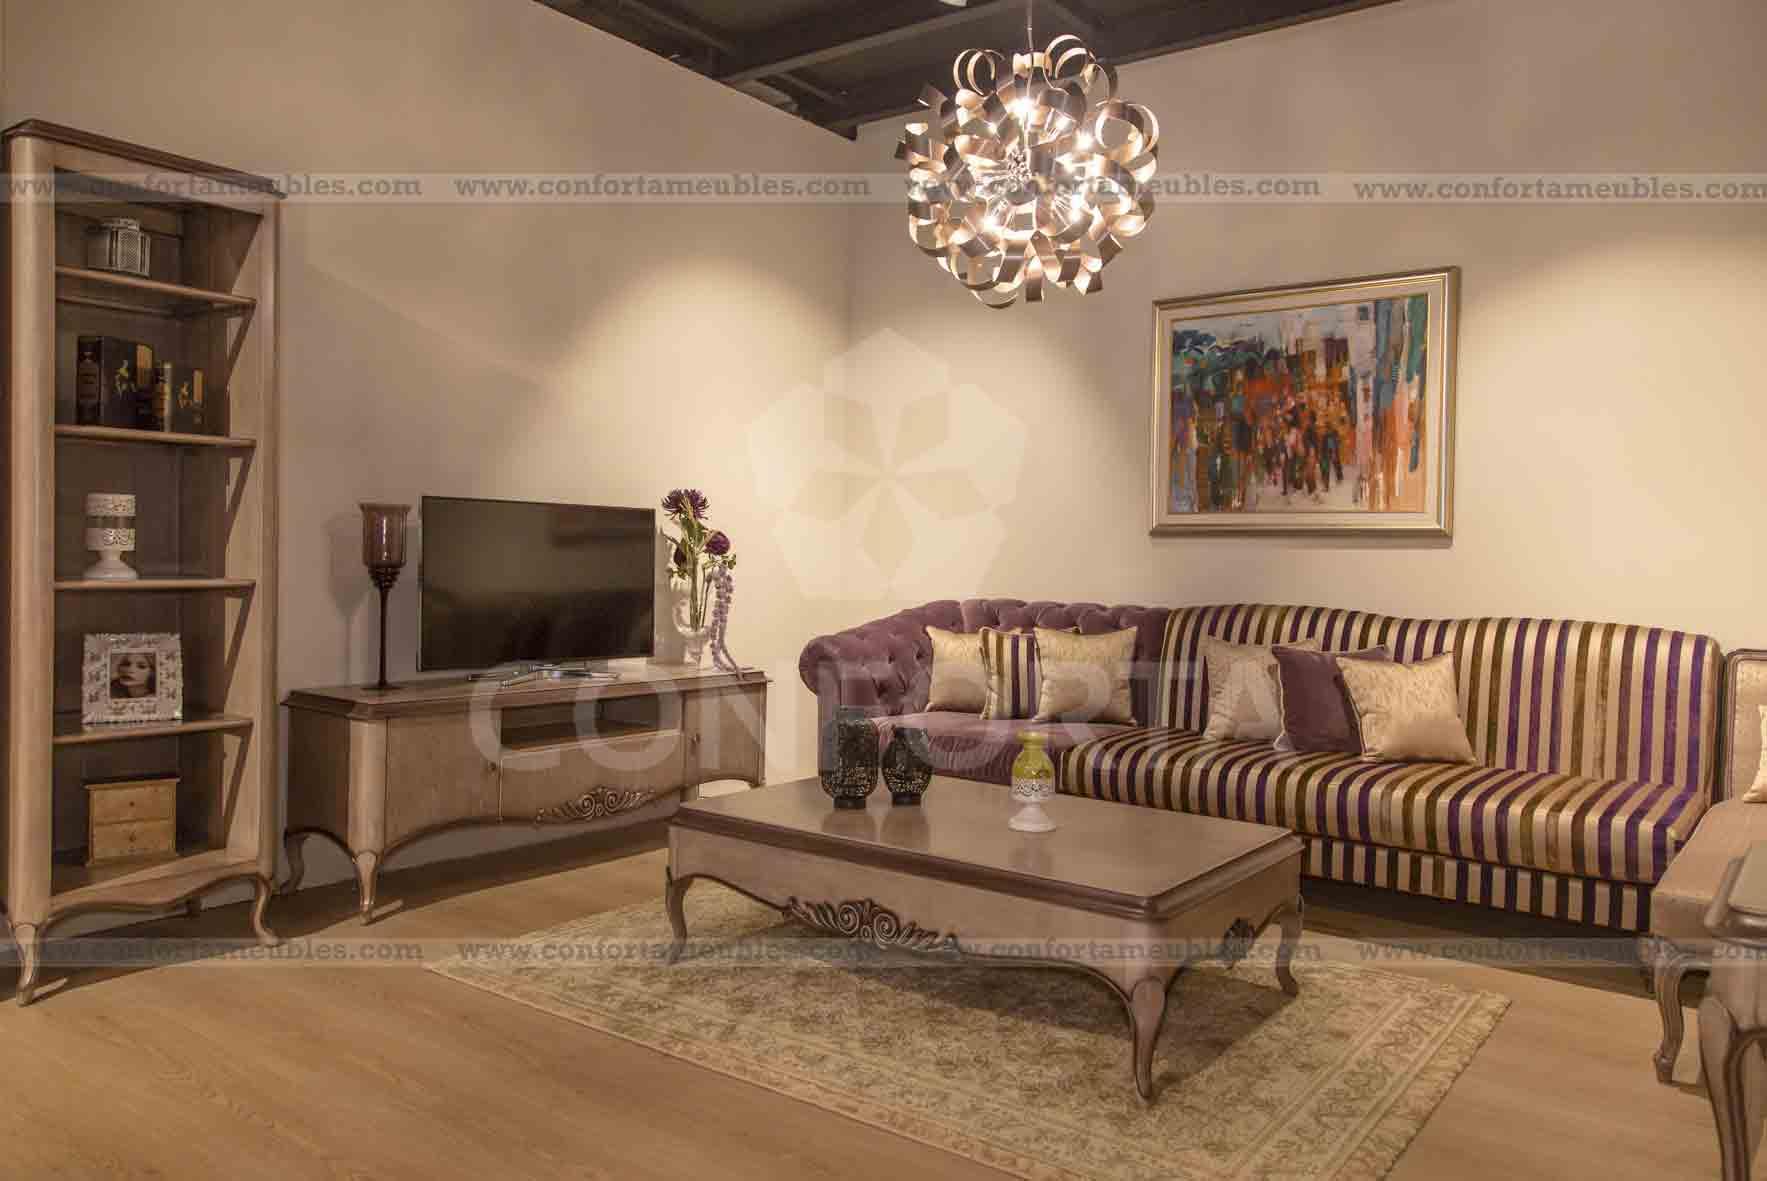 meuble tv tunisie meubles et d coration tunisie